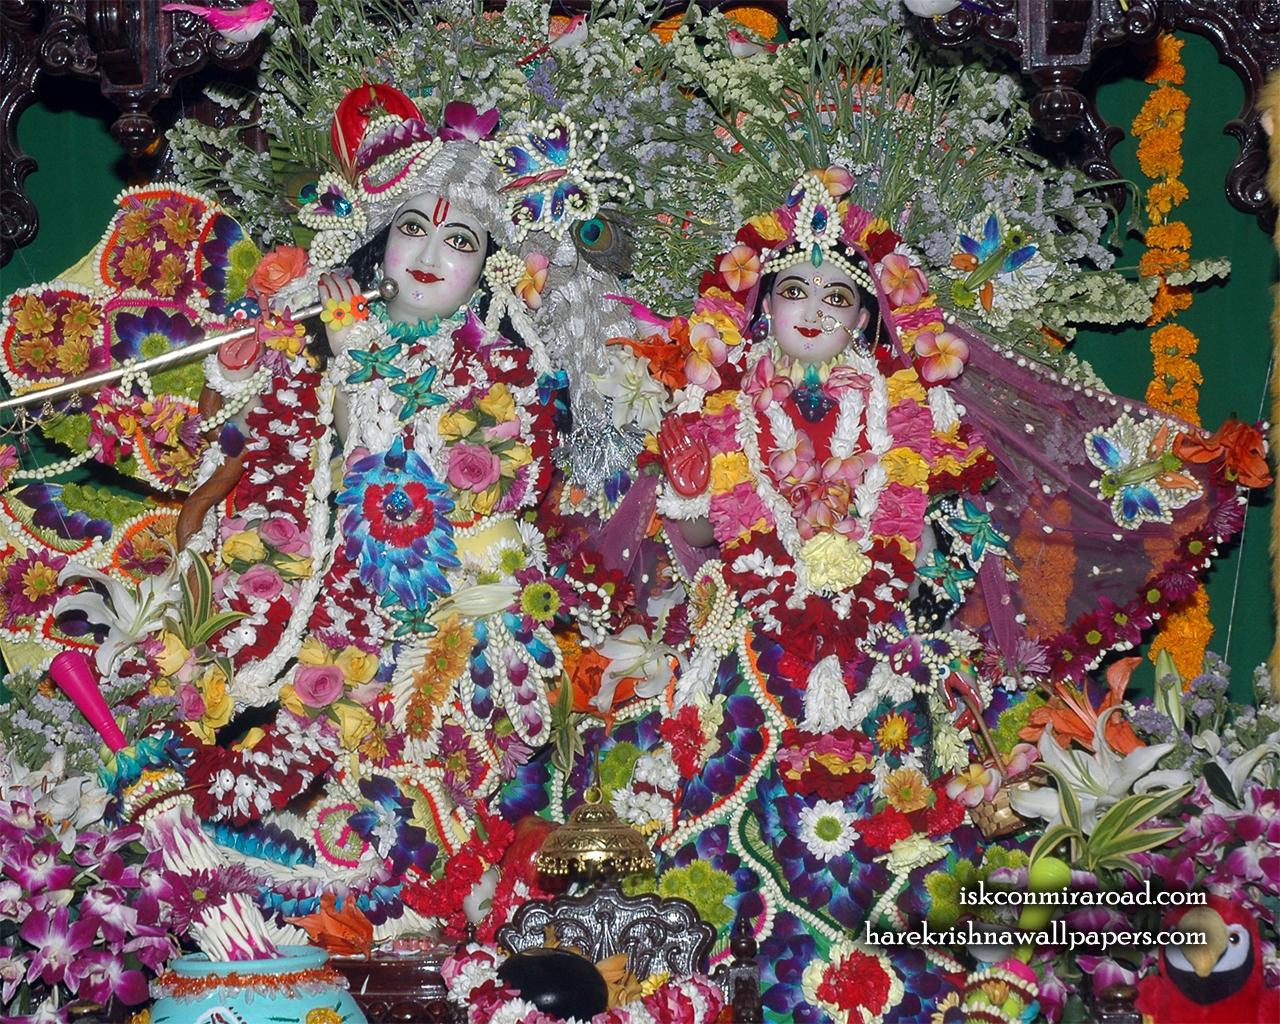 Sri Sri Radha Giridhari Wallpaper (012) Size 1280x1024 Download